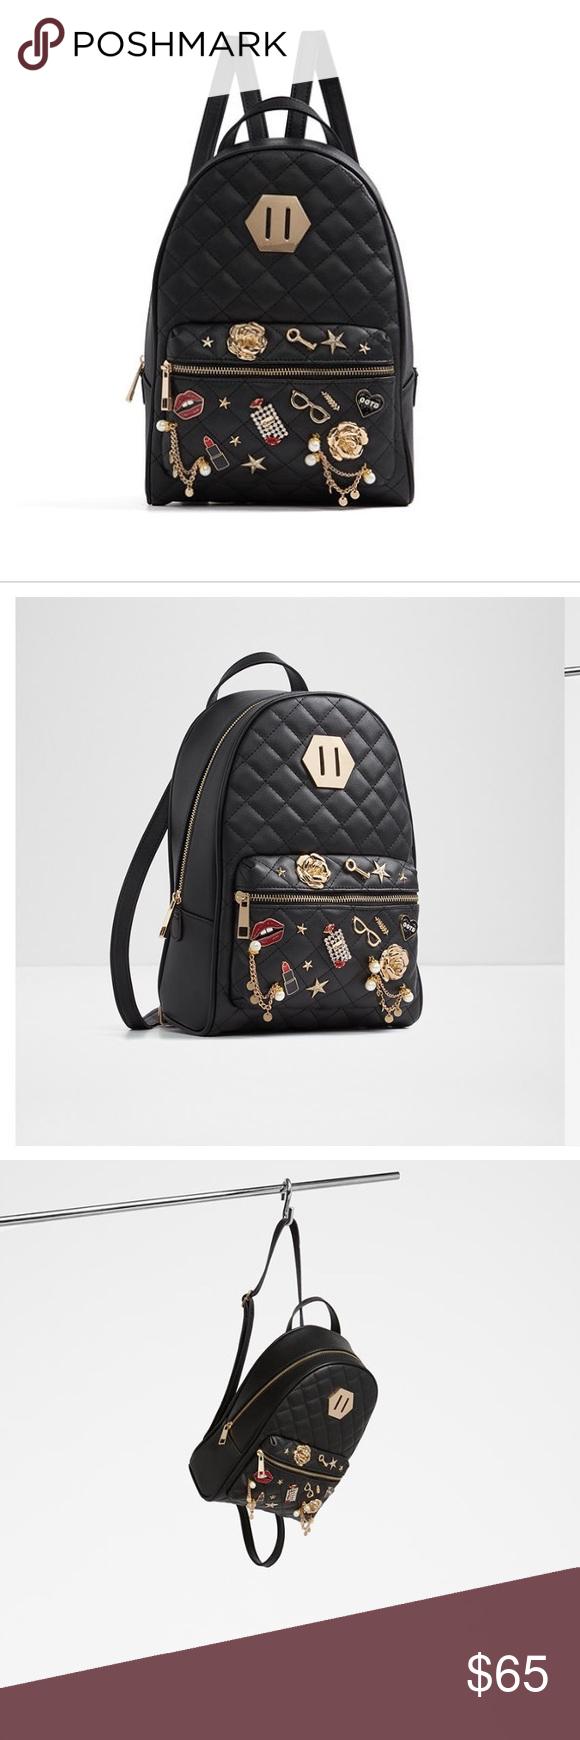 40c664218cf8 BRAND NEW ALDO BOOKBAG WITH CHARMS Brand new beautiful aldo book bag a good  size with charms